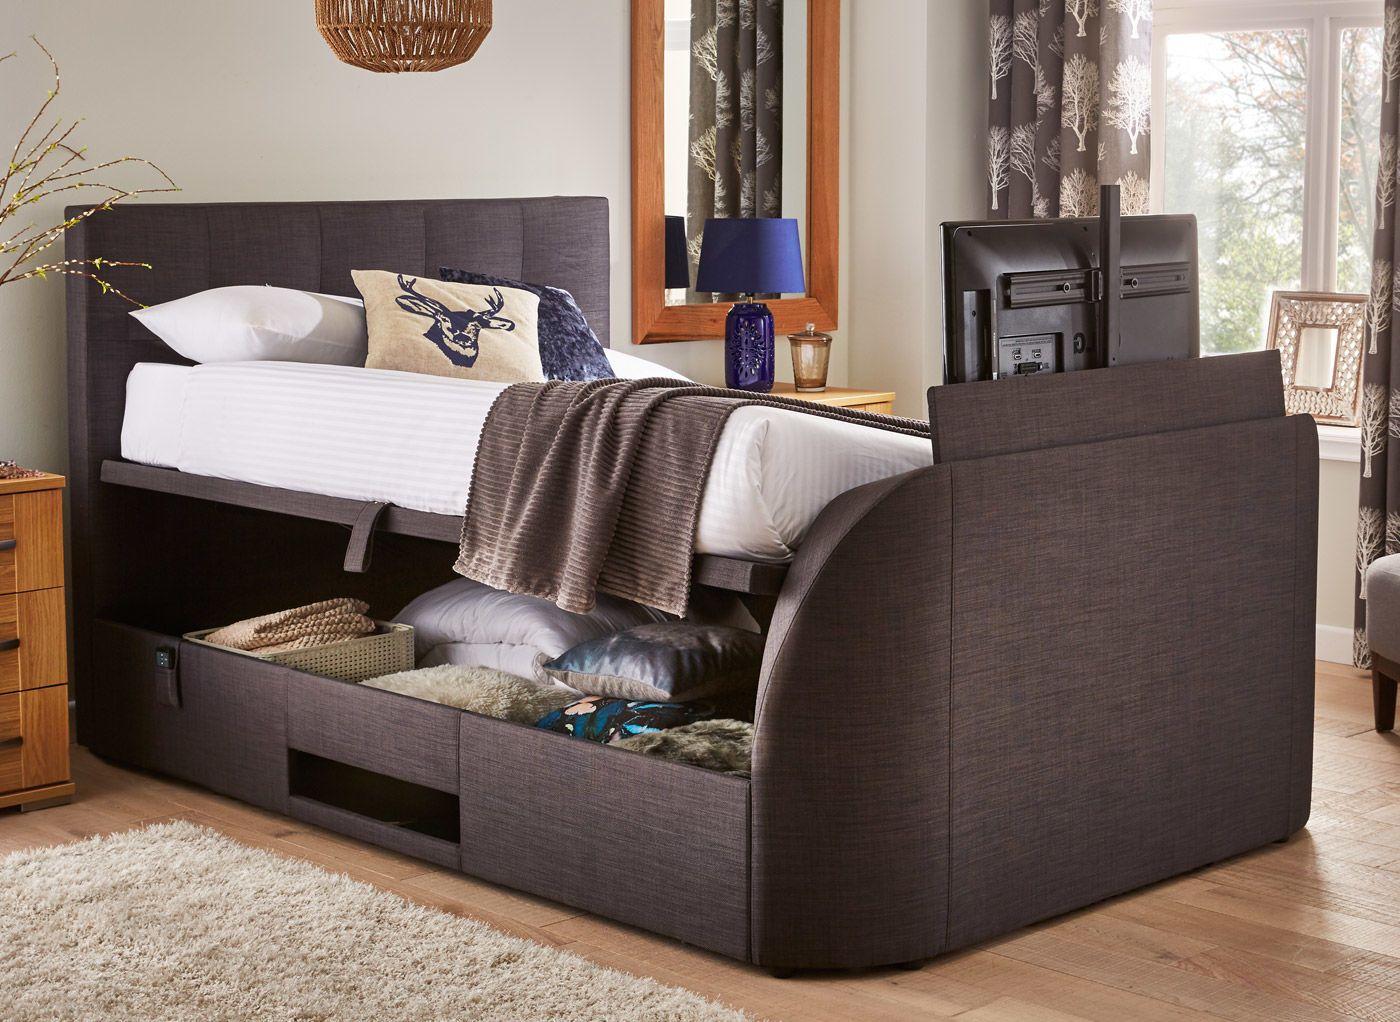 Best Evolution Fabric Upholstered Ottoman 43 Lg Tv Bed Frame 400 x 300